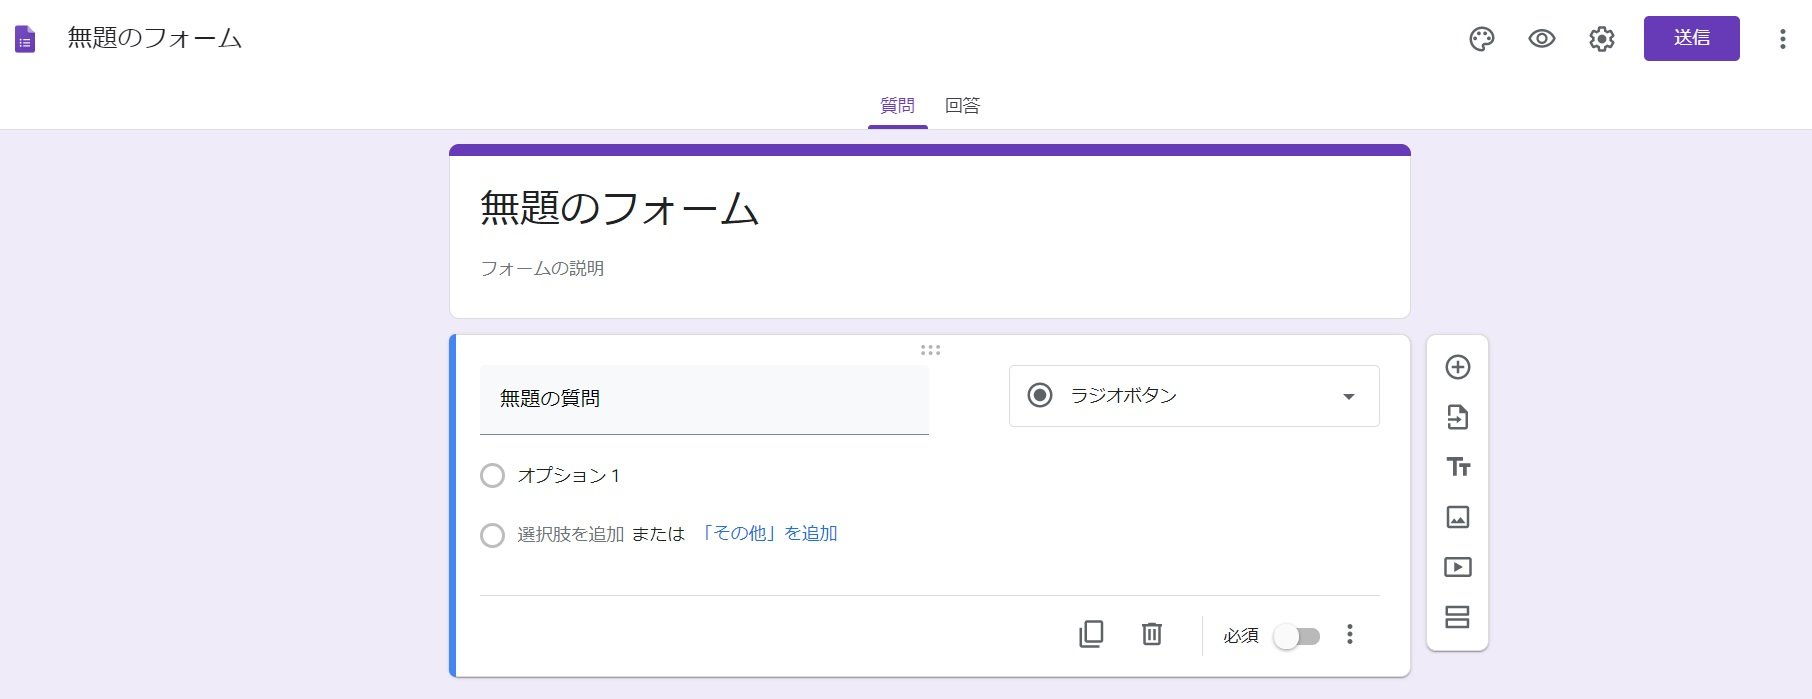 googleF-4